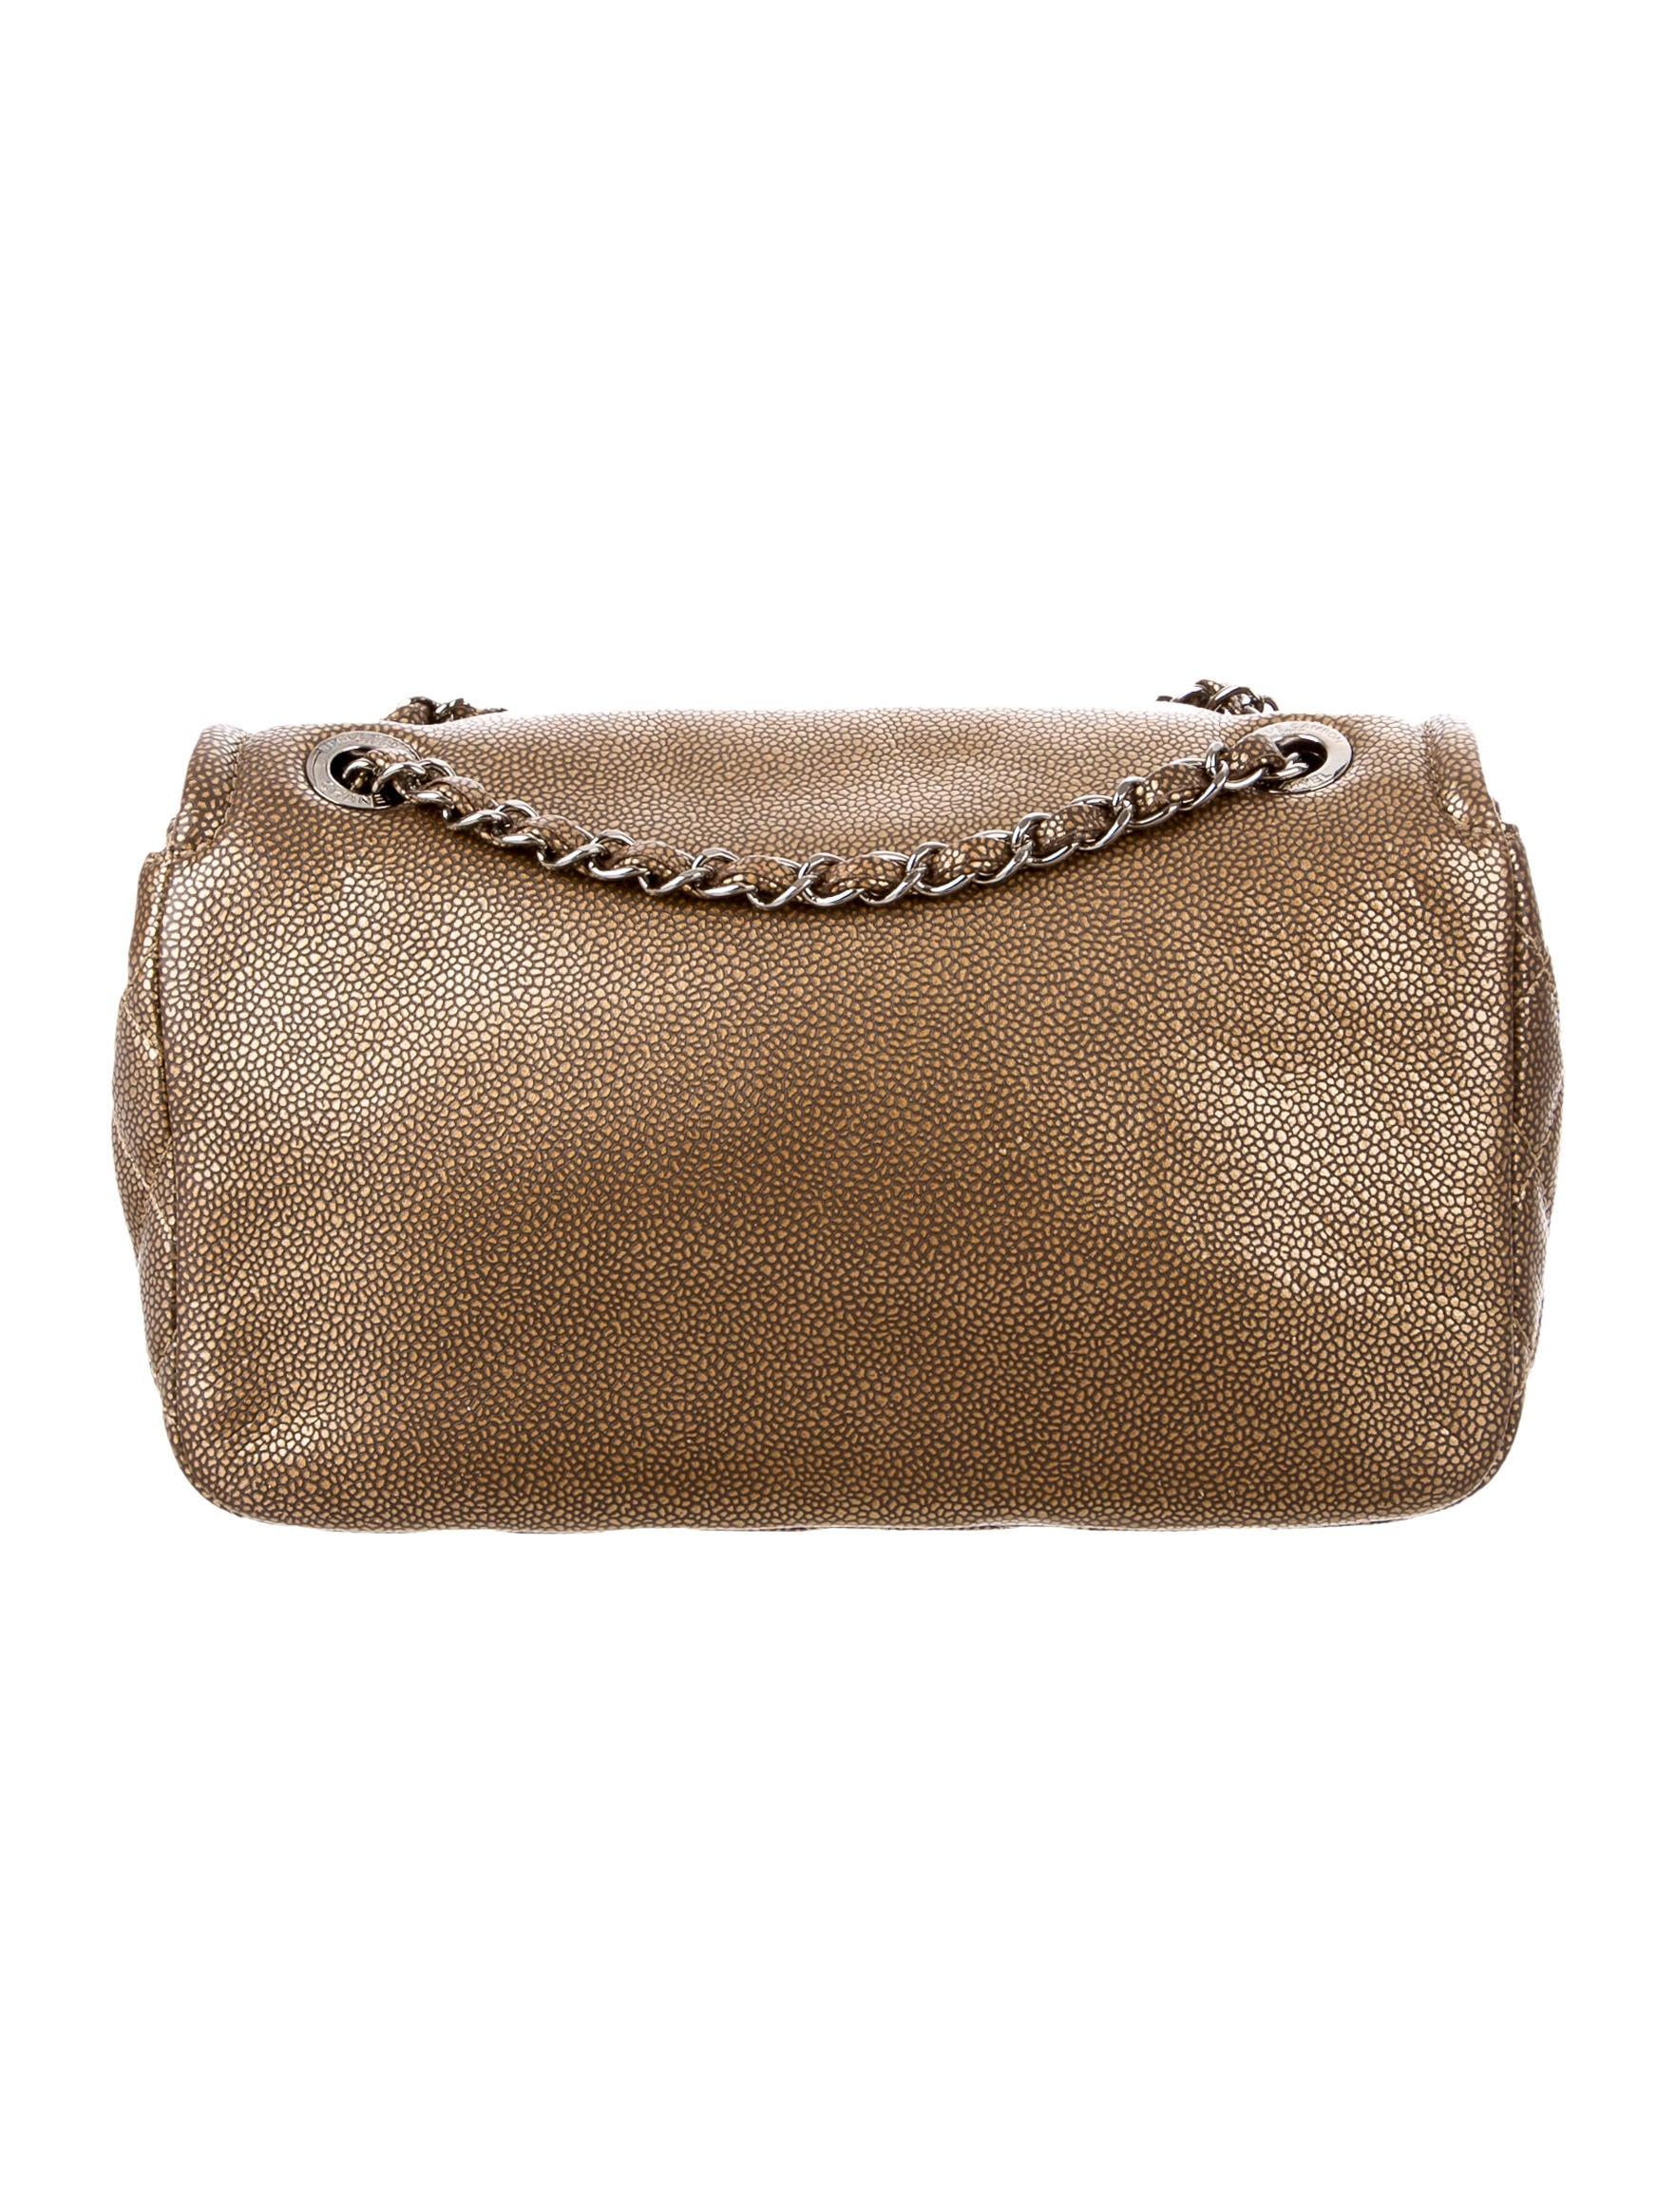 Chanel medium flap bag caviar